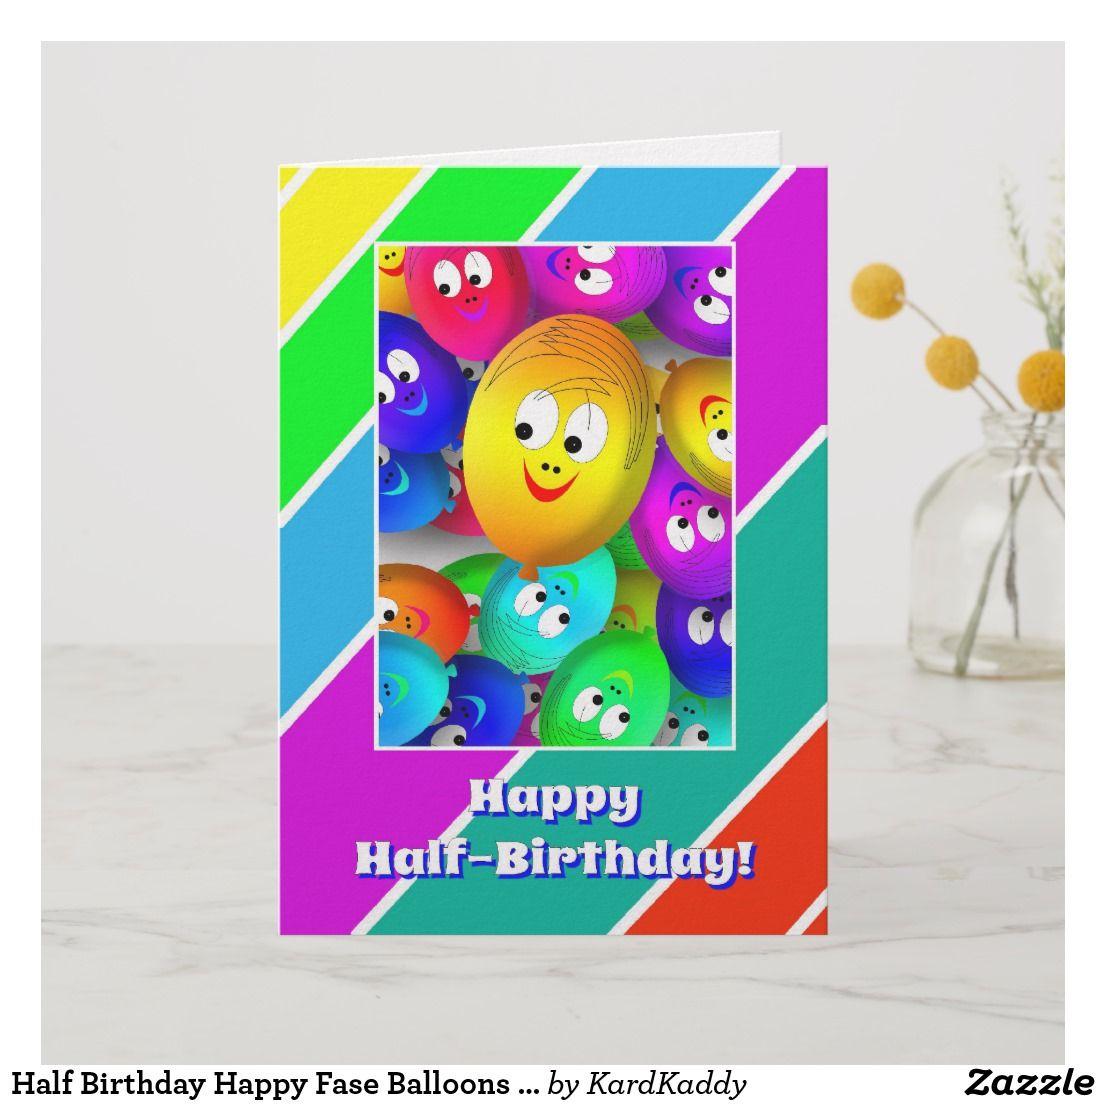 Half Birthday Happy Fase Balloons Card Zazzle Com Happy Half Birthday Half Birthday Happy Birthday